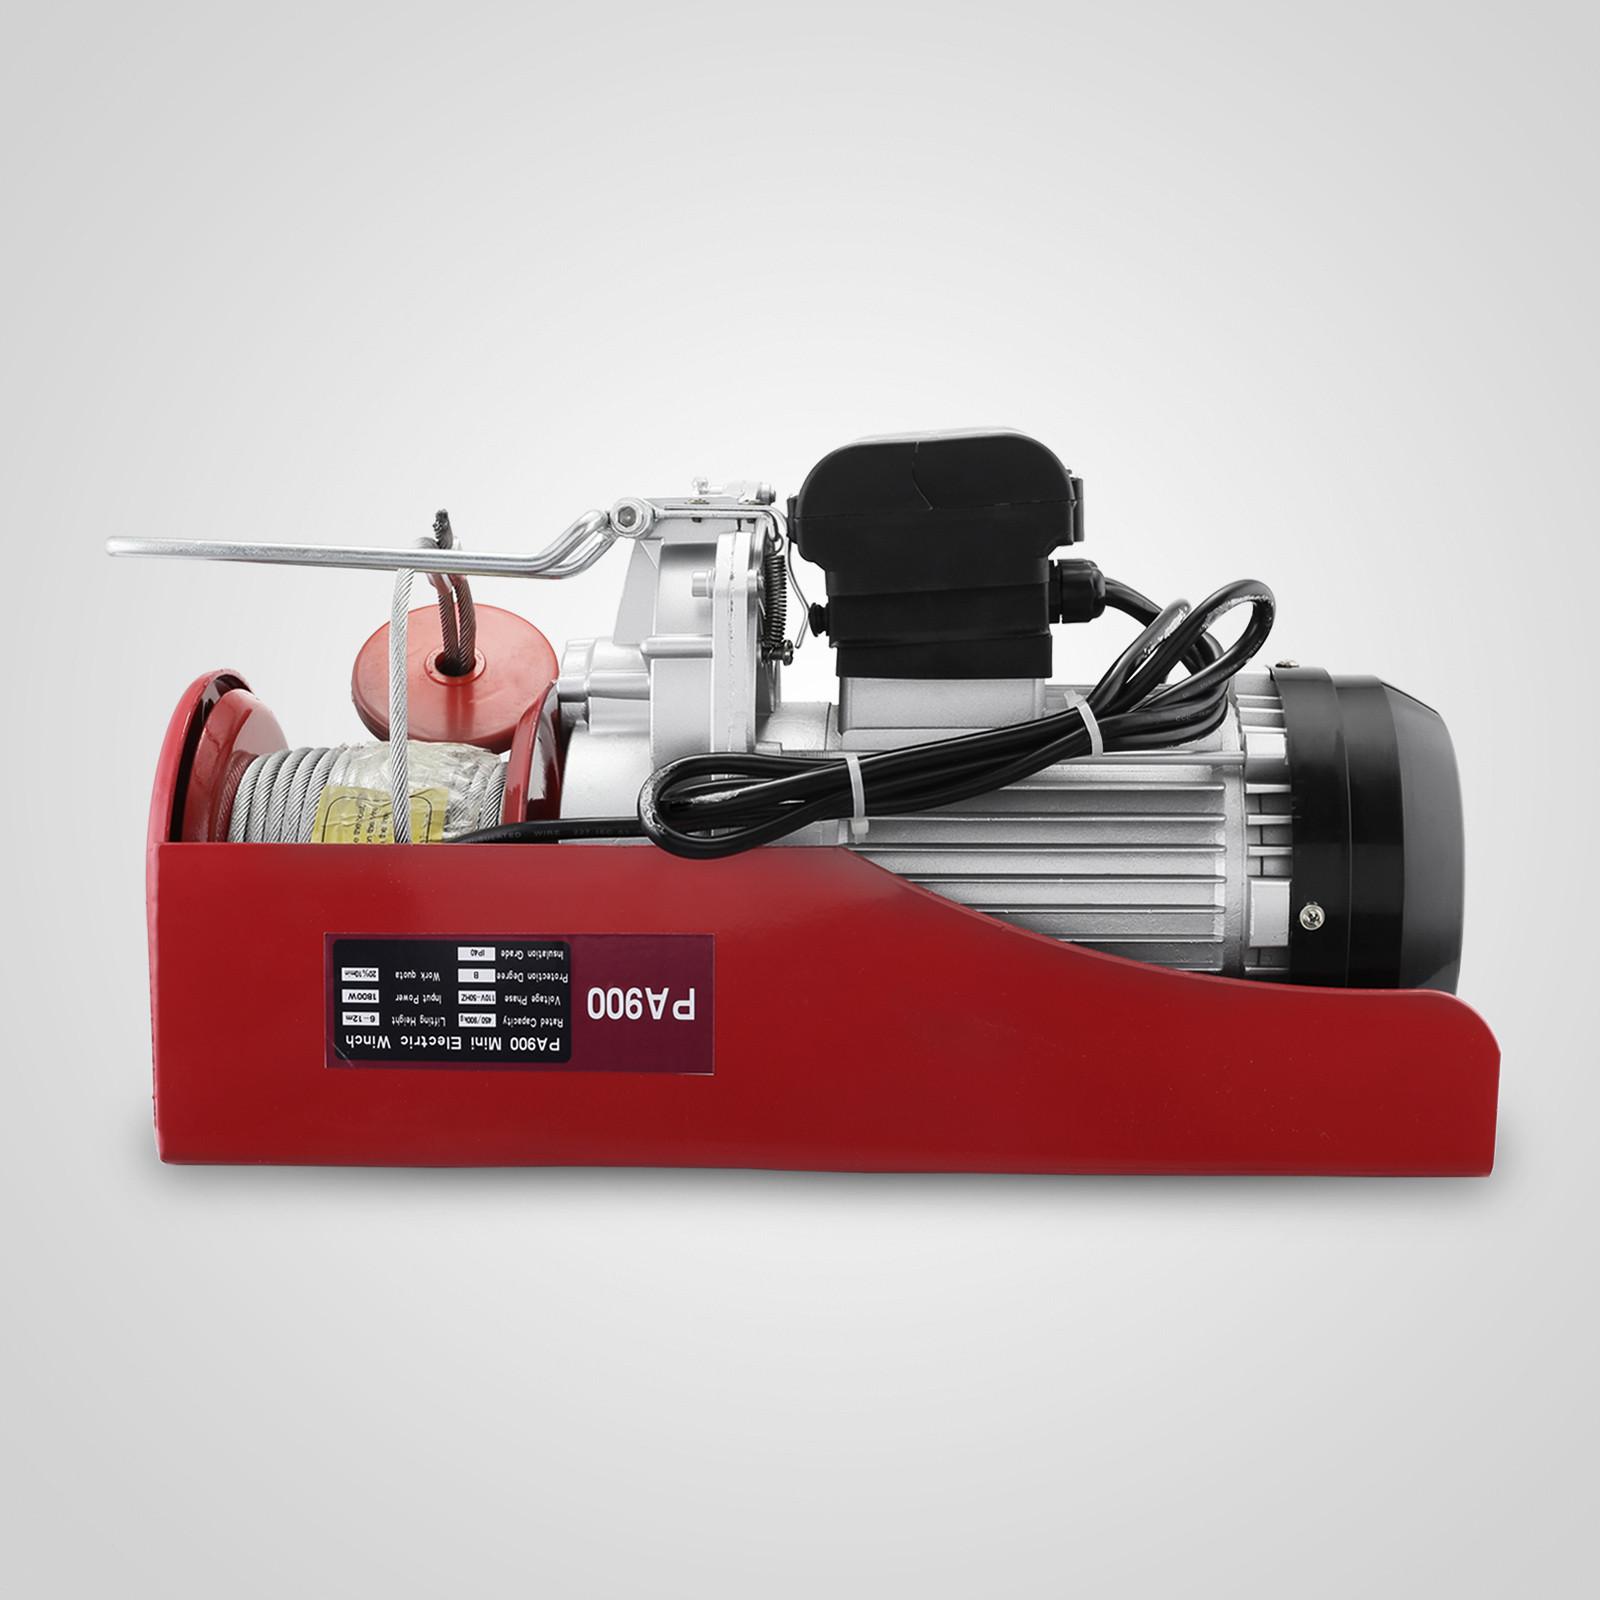 100kg-900kg-Electric-Hoist-Winch-Lifting-Engine-Crane-Cable-Lift-Hook-Garage miniature 66